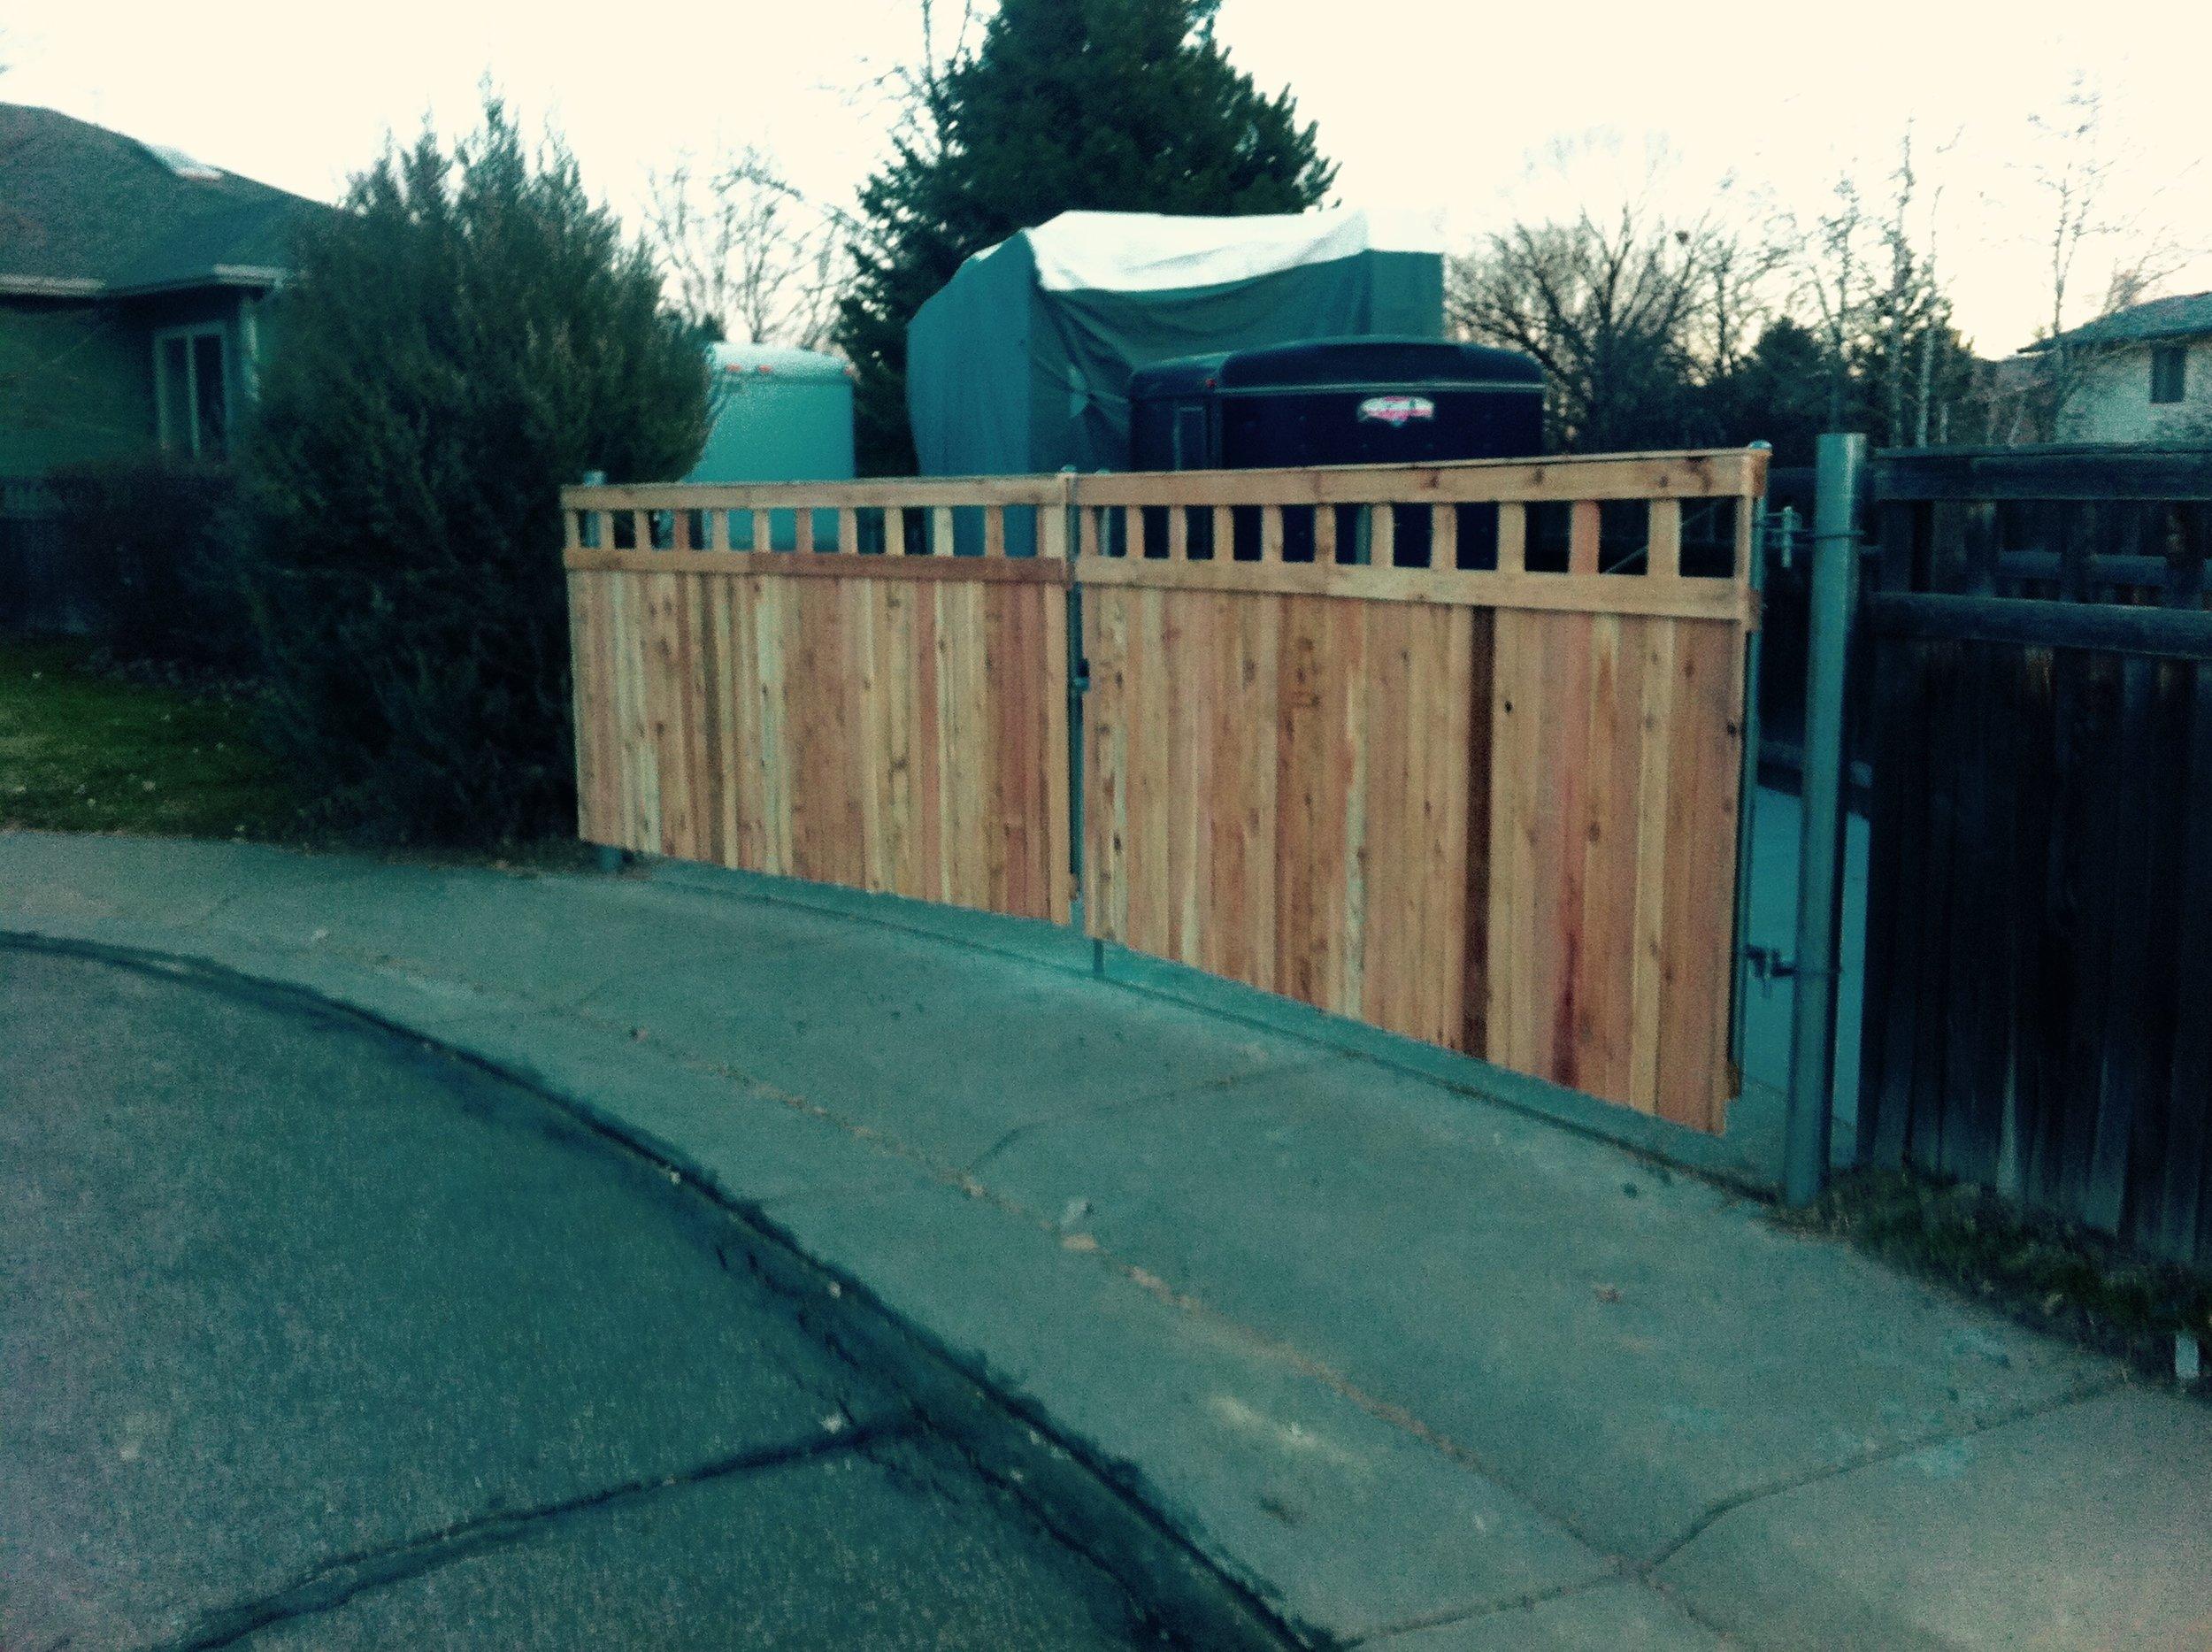 RV parking double gates - cedar on top of steel posts/framework